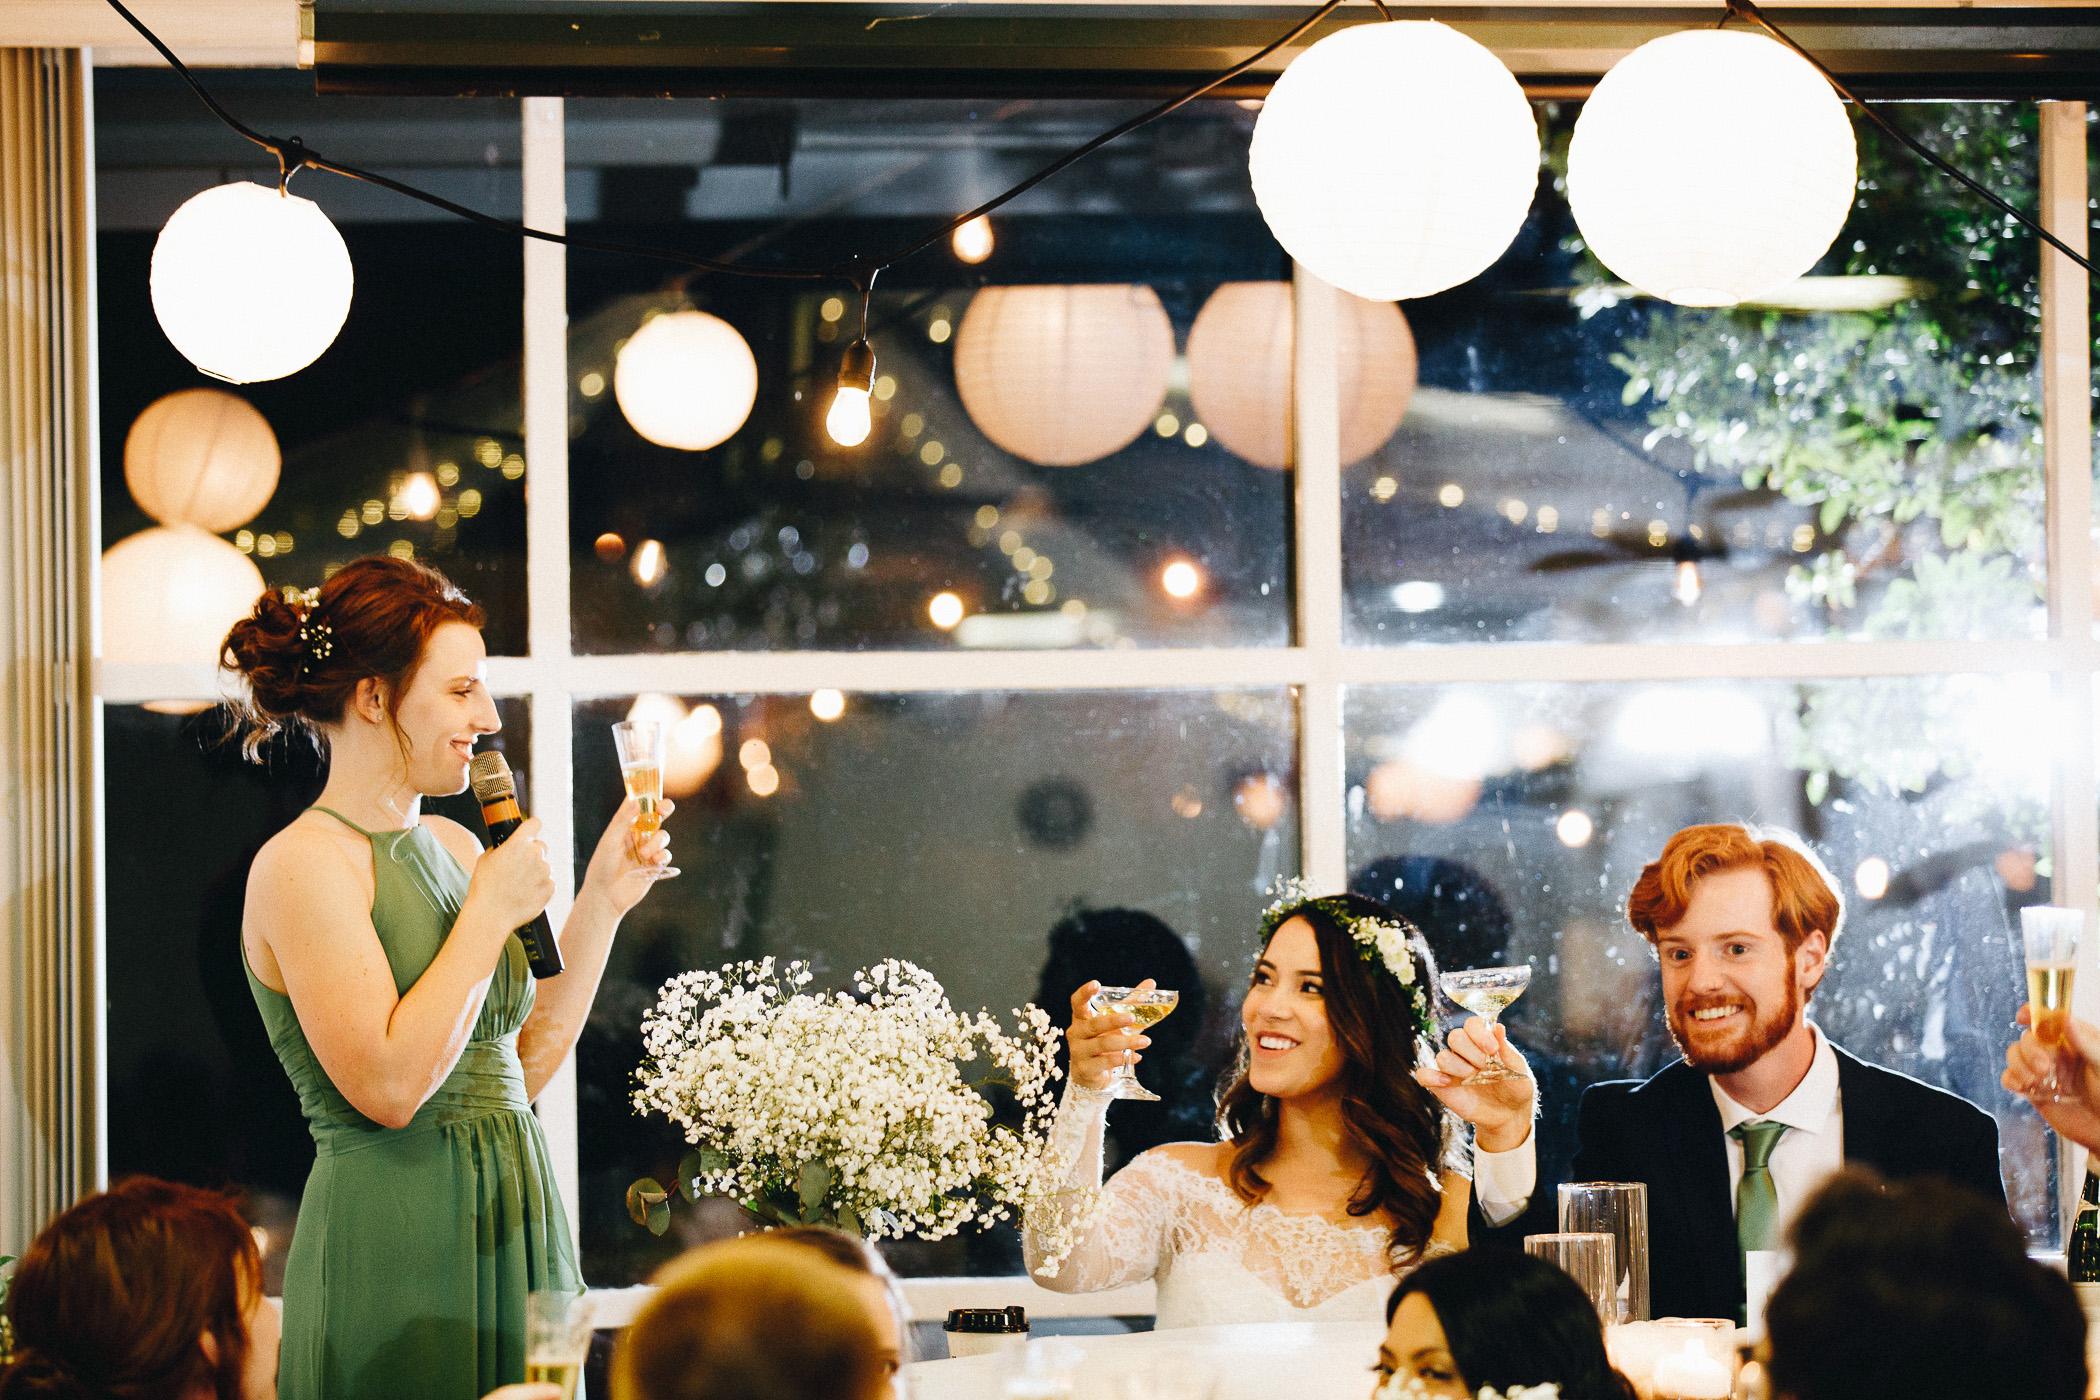 181104-Luxium-Weddings-Arizona-@matt__Le-Brandon-Kariana-Phoenix-Valley-Garden-Center-1137.jpg